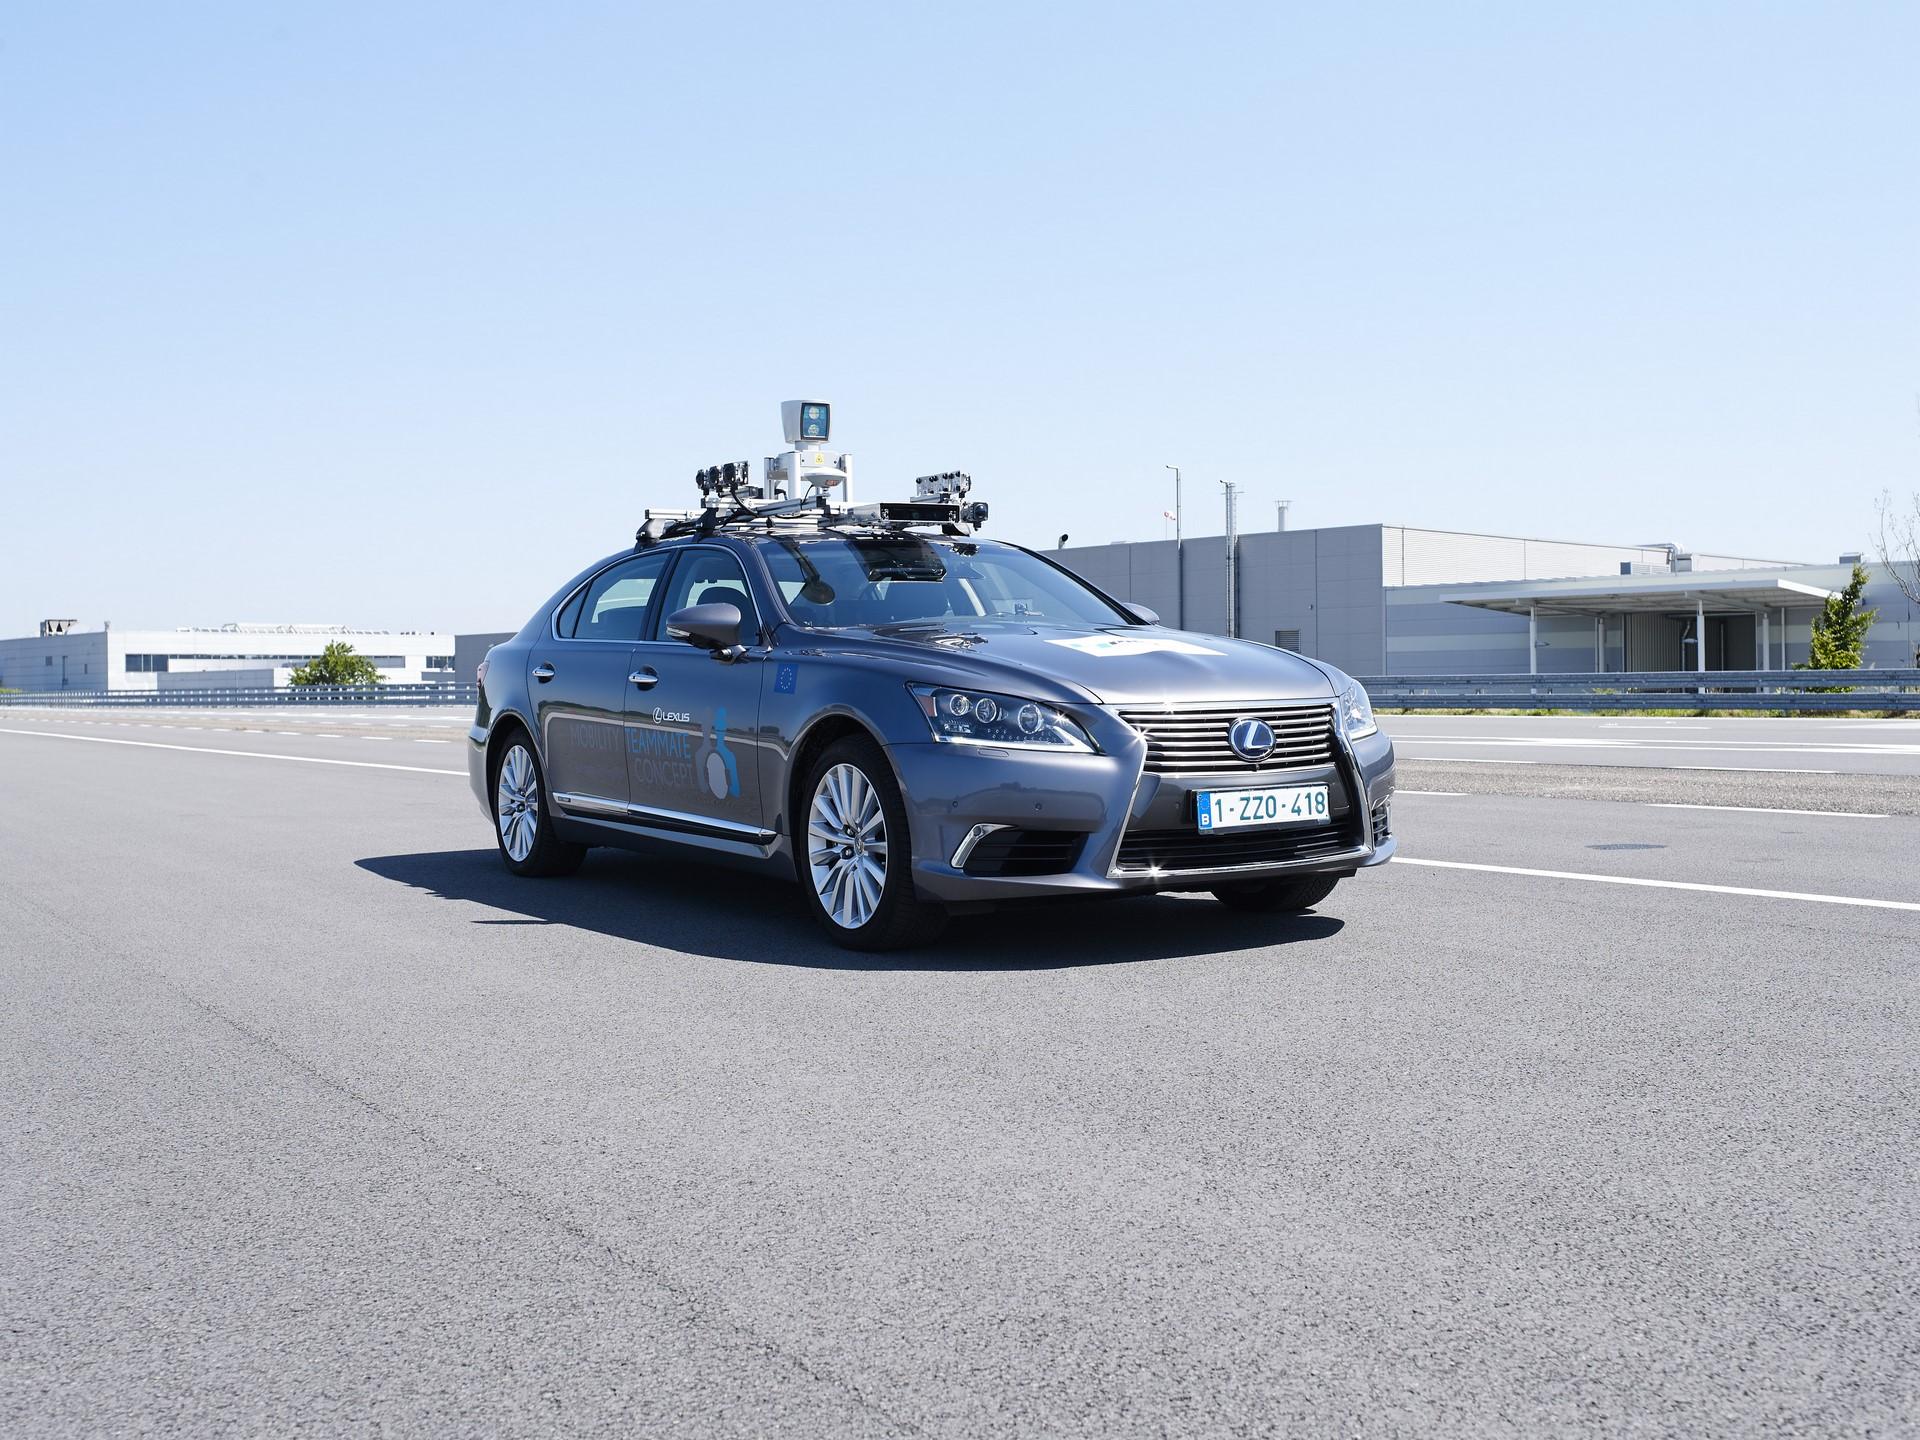 Toyota-Autonomous-Europe-Lexus-LS-13